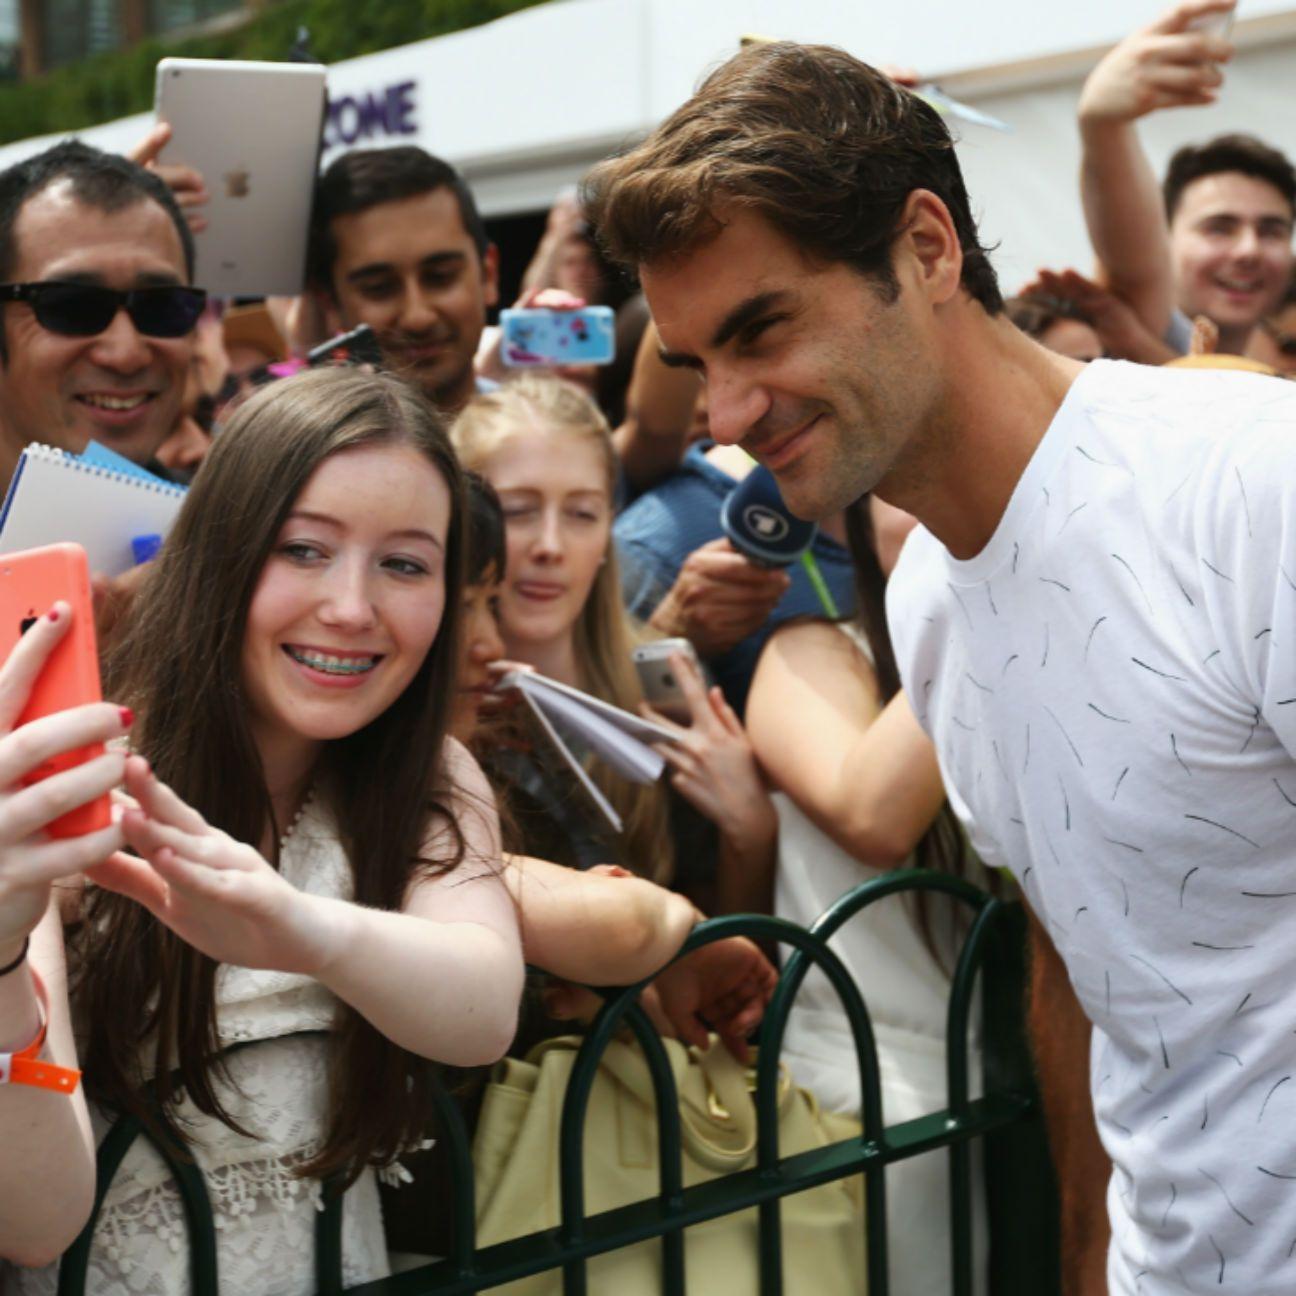 The Latest: Roger Federer Advances to Wimbledon Semifinals Roger Federer  #RogerFederer